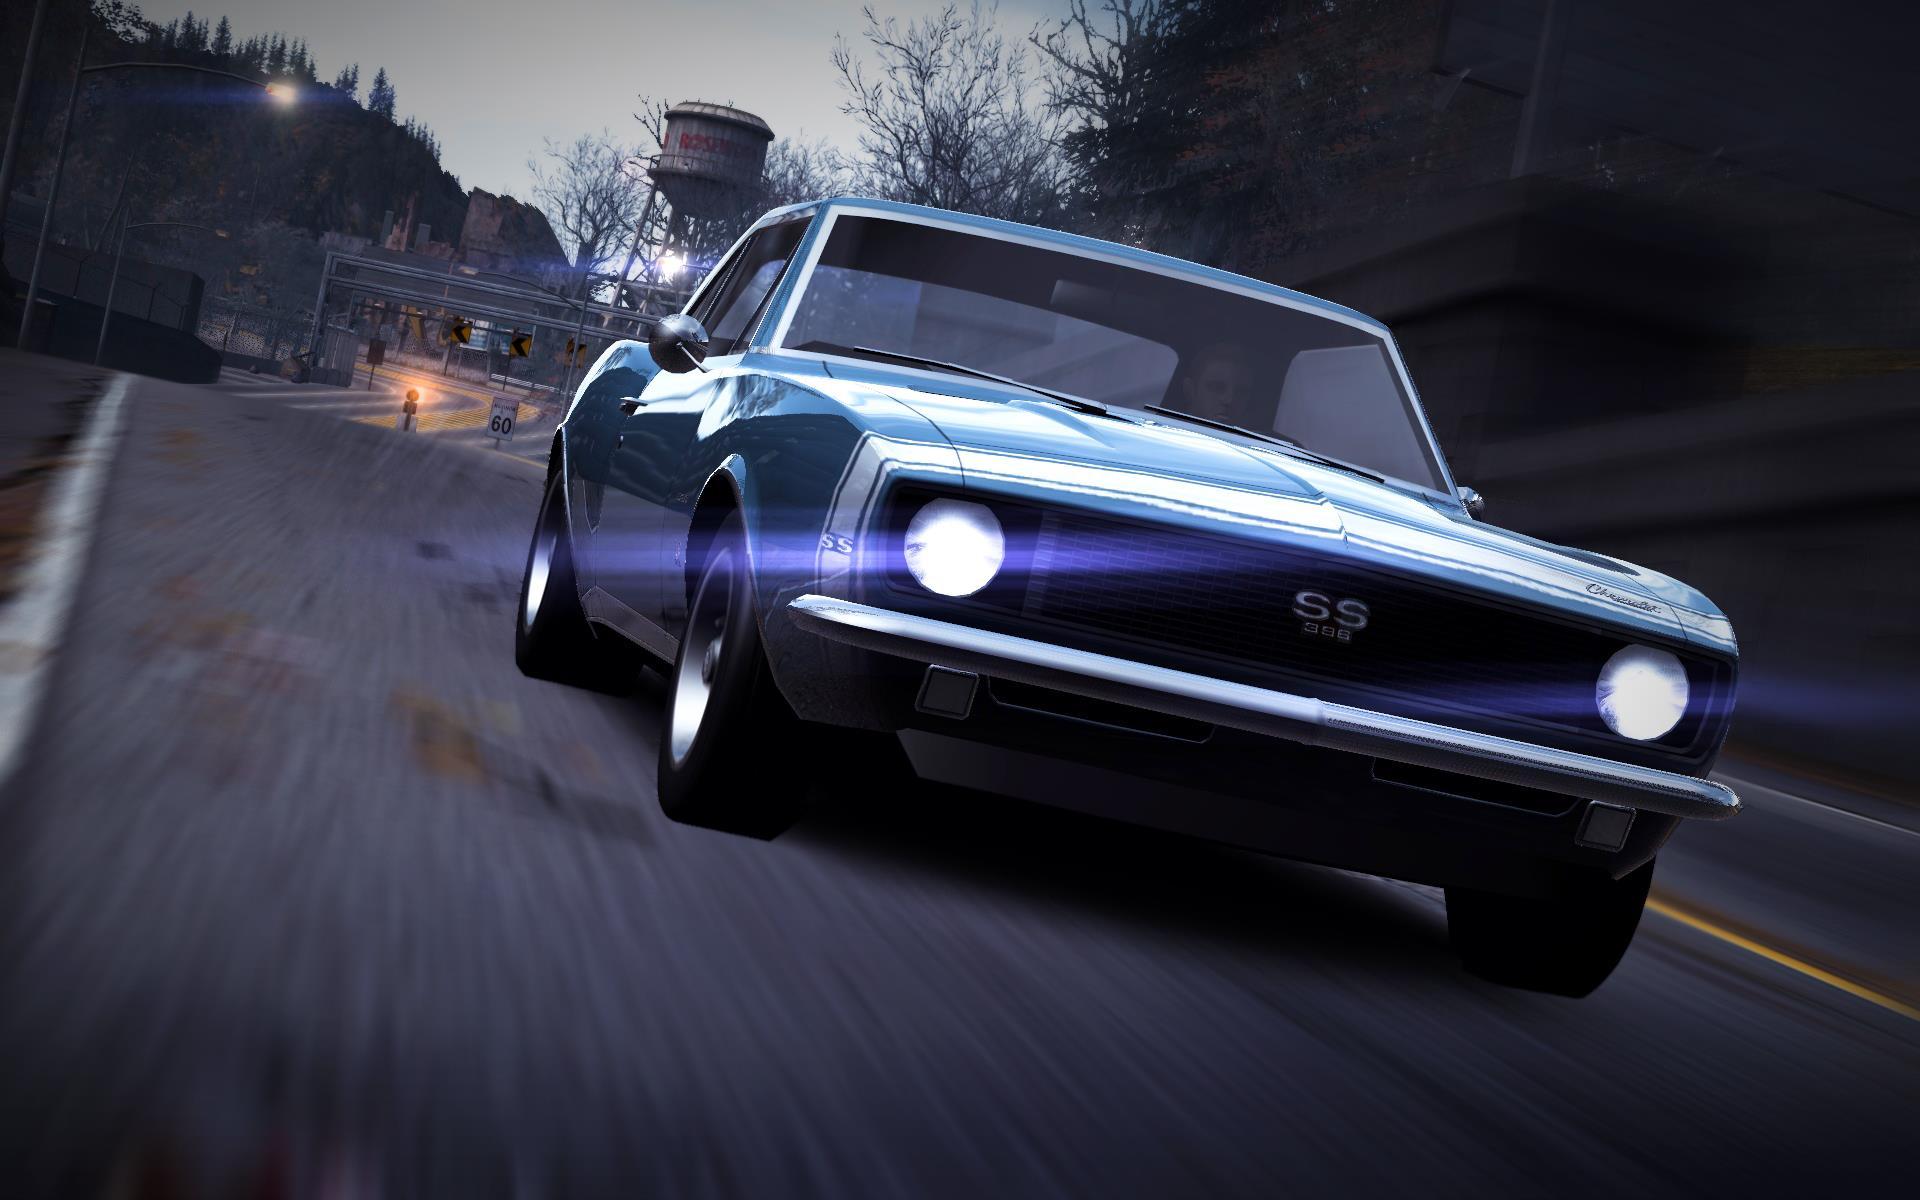 Image Carrelease Chevrolet Camaro Ss Blue Jpg Nfs World Wiki